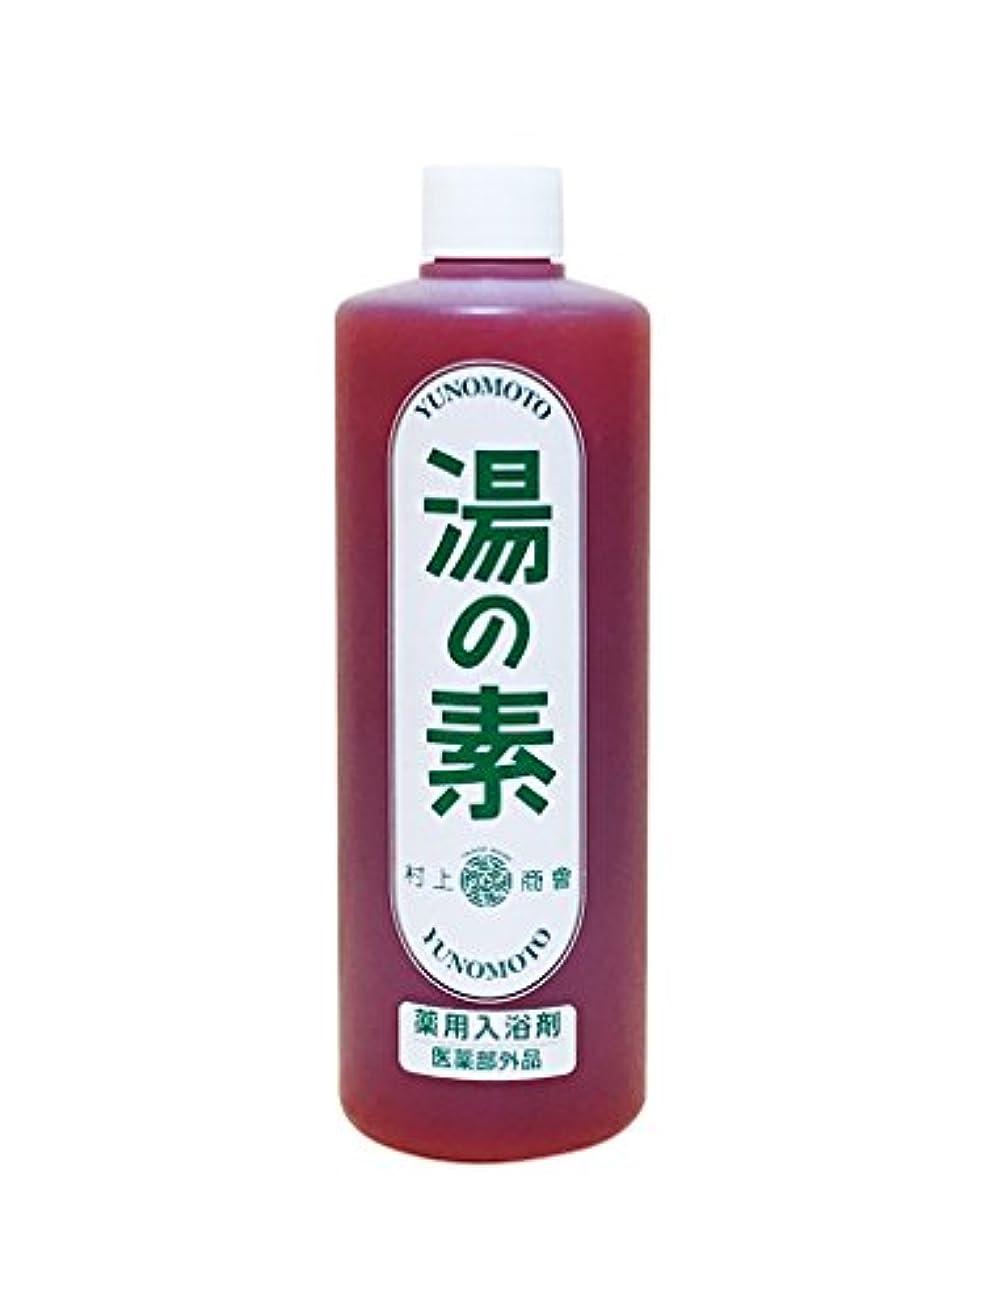 お申込み核硫黄乳白色湯 湯の素 薬用入浴剤 (医薬部外品) 490g